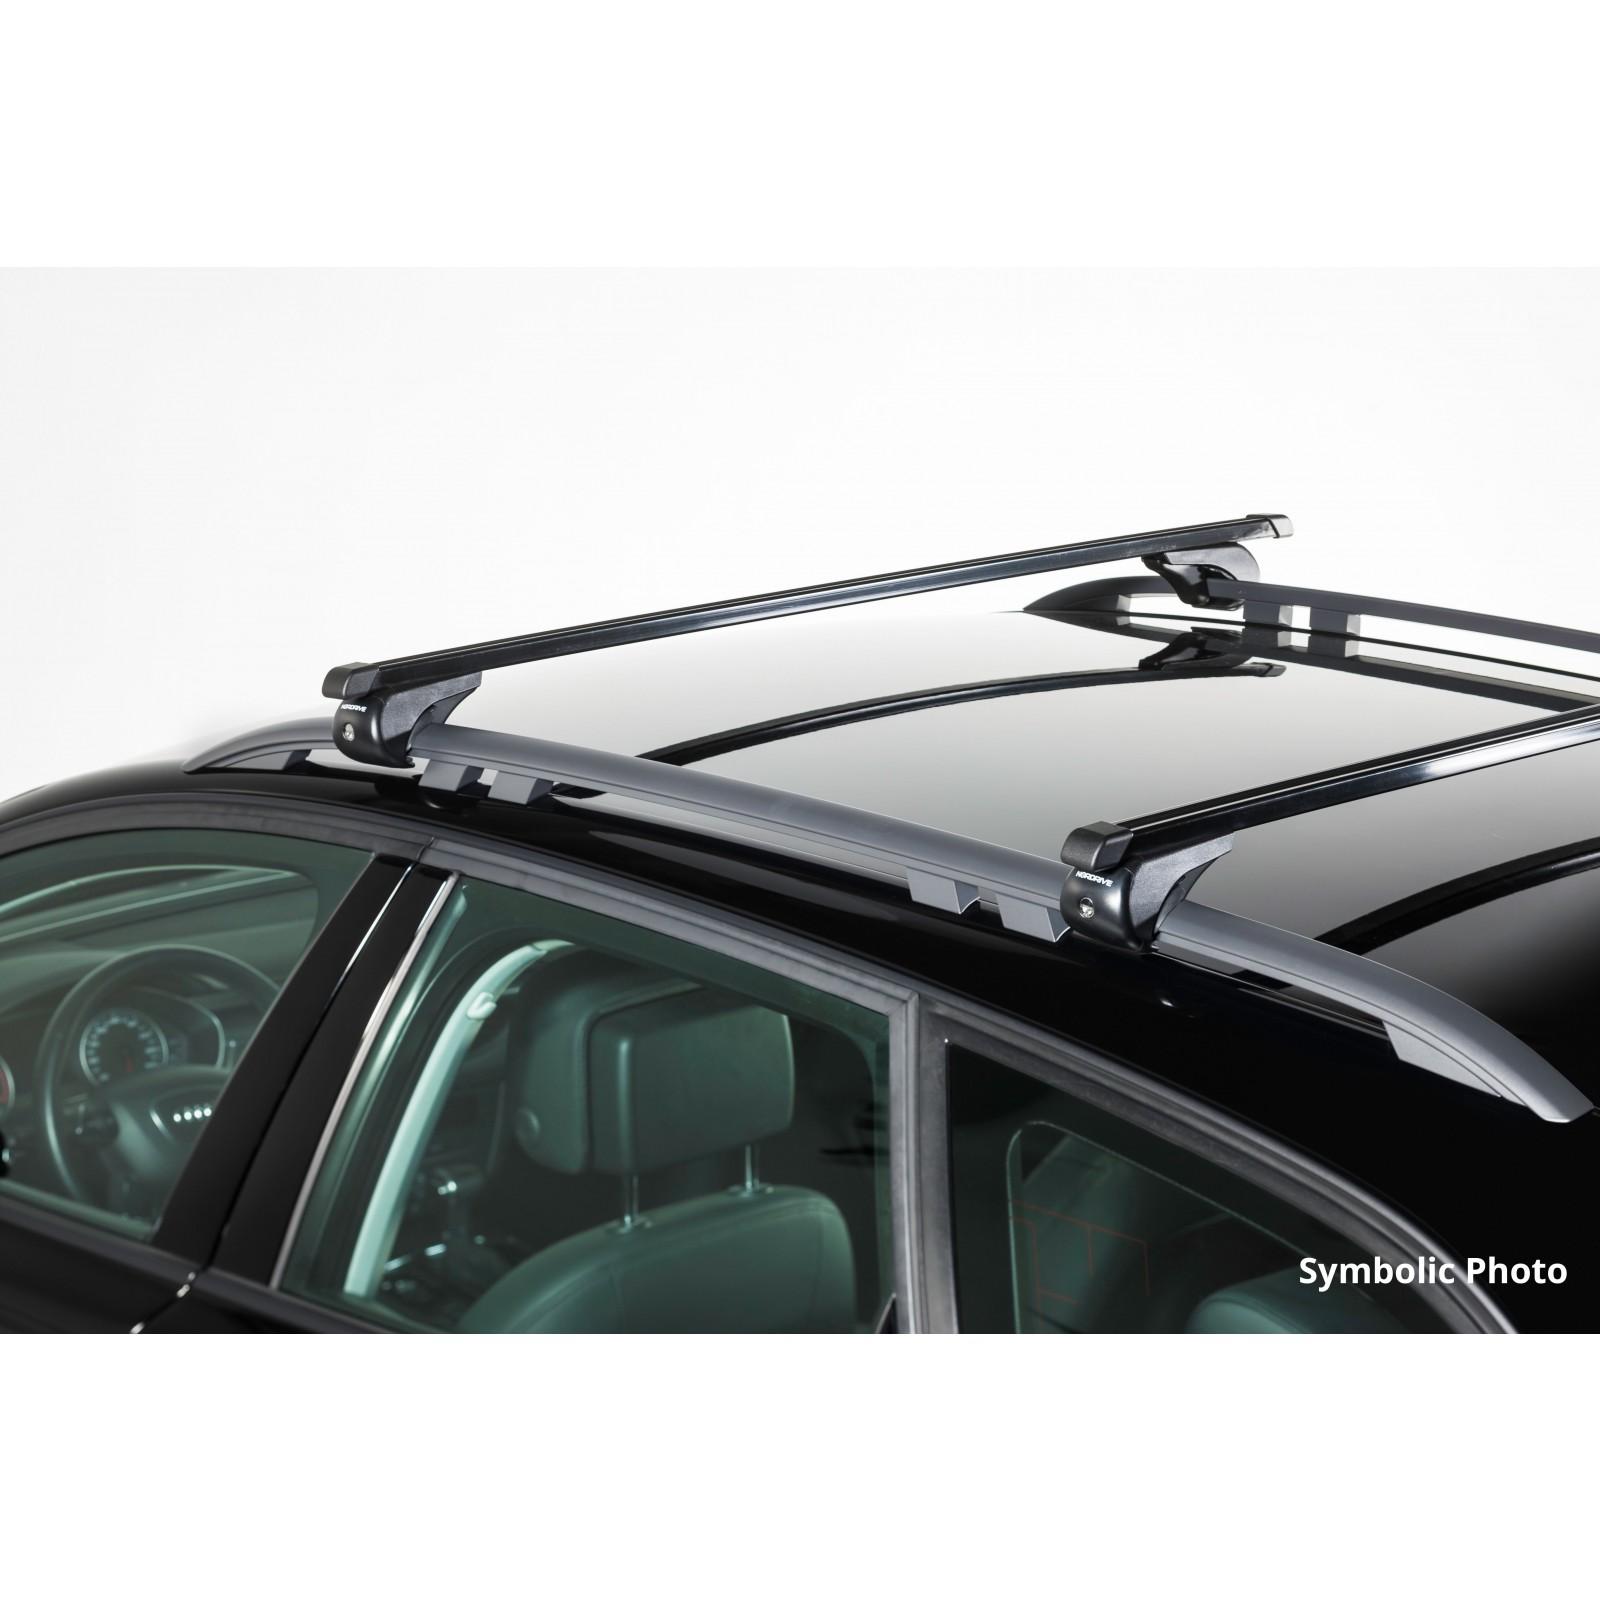 barres de toit en acier pour mitsubishi pajero pinin 5p 120cm. Black Bedroom Furniture Sets. Home Design Ideas